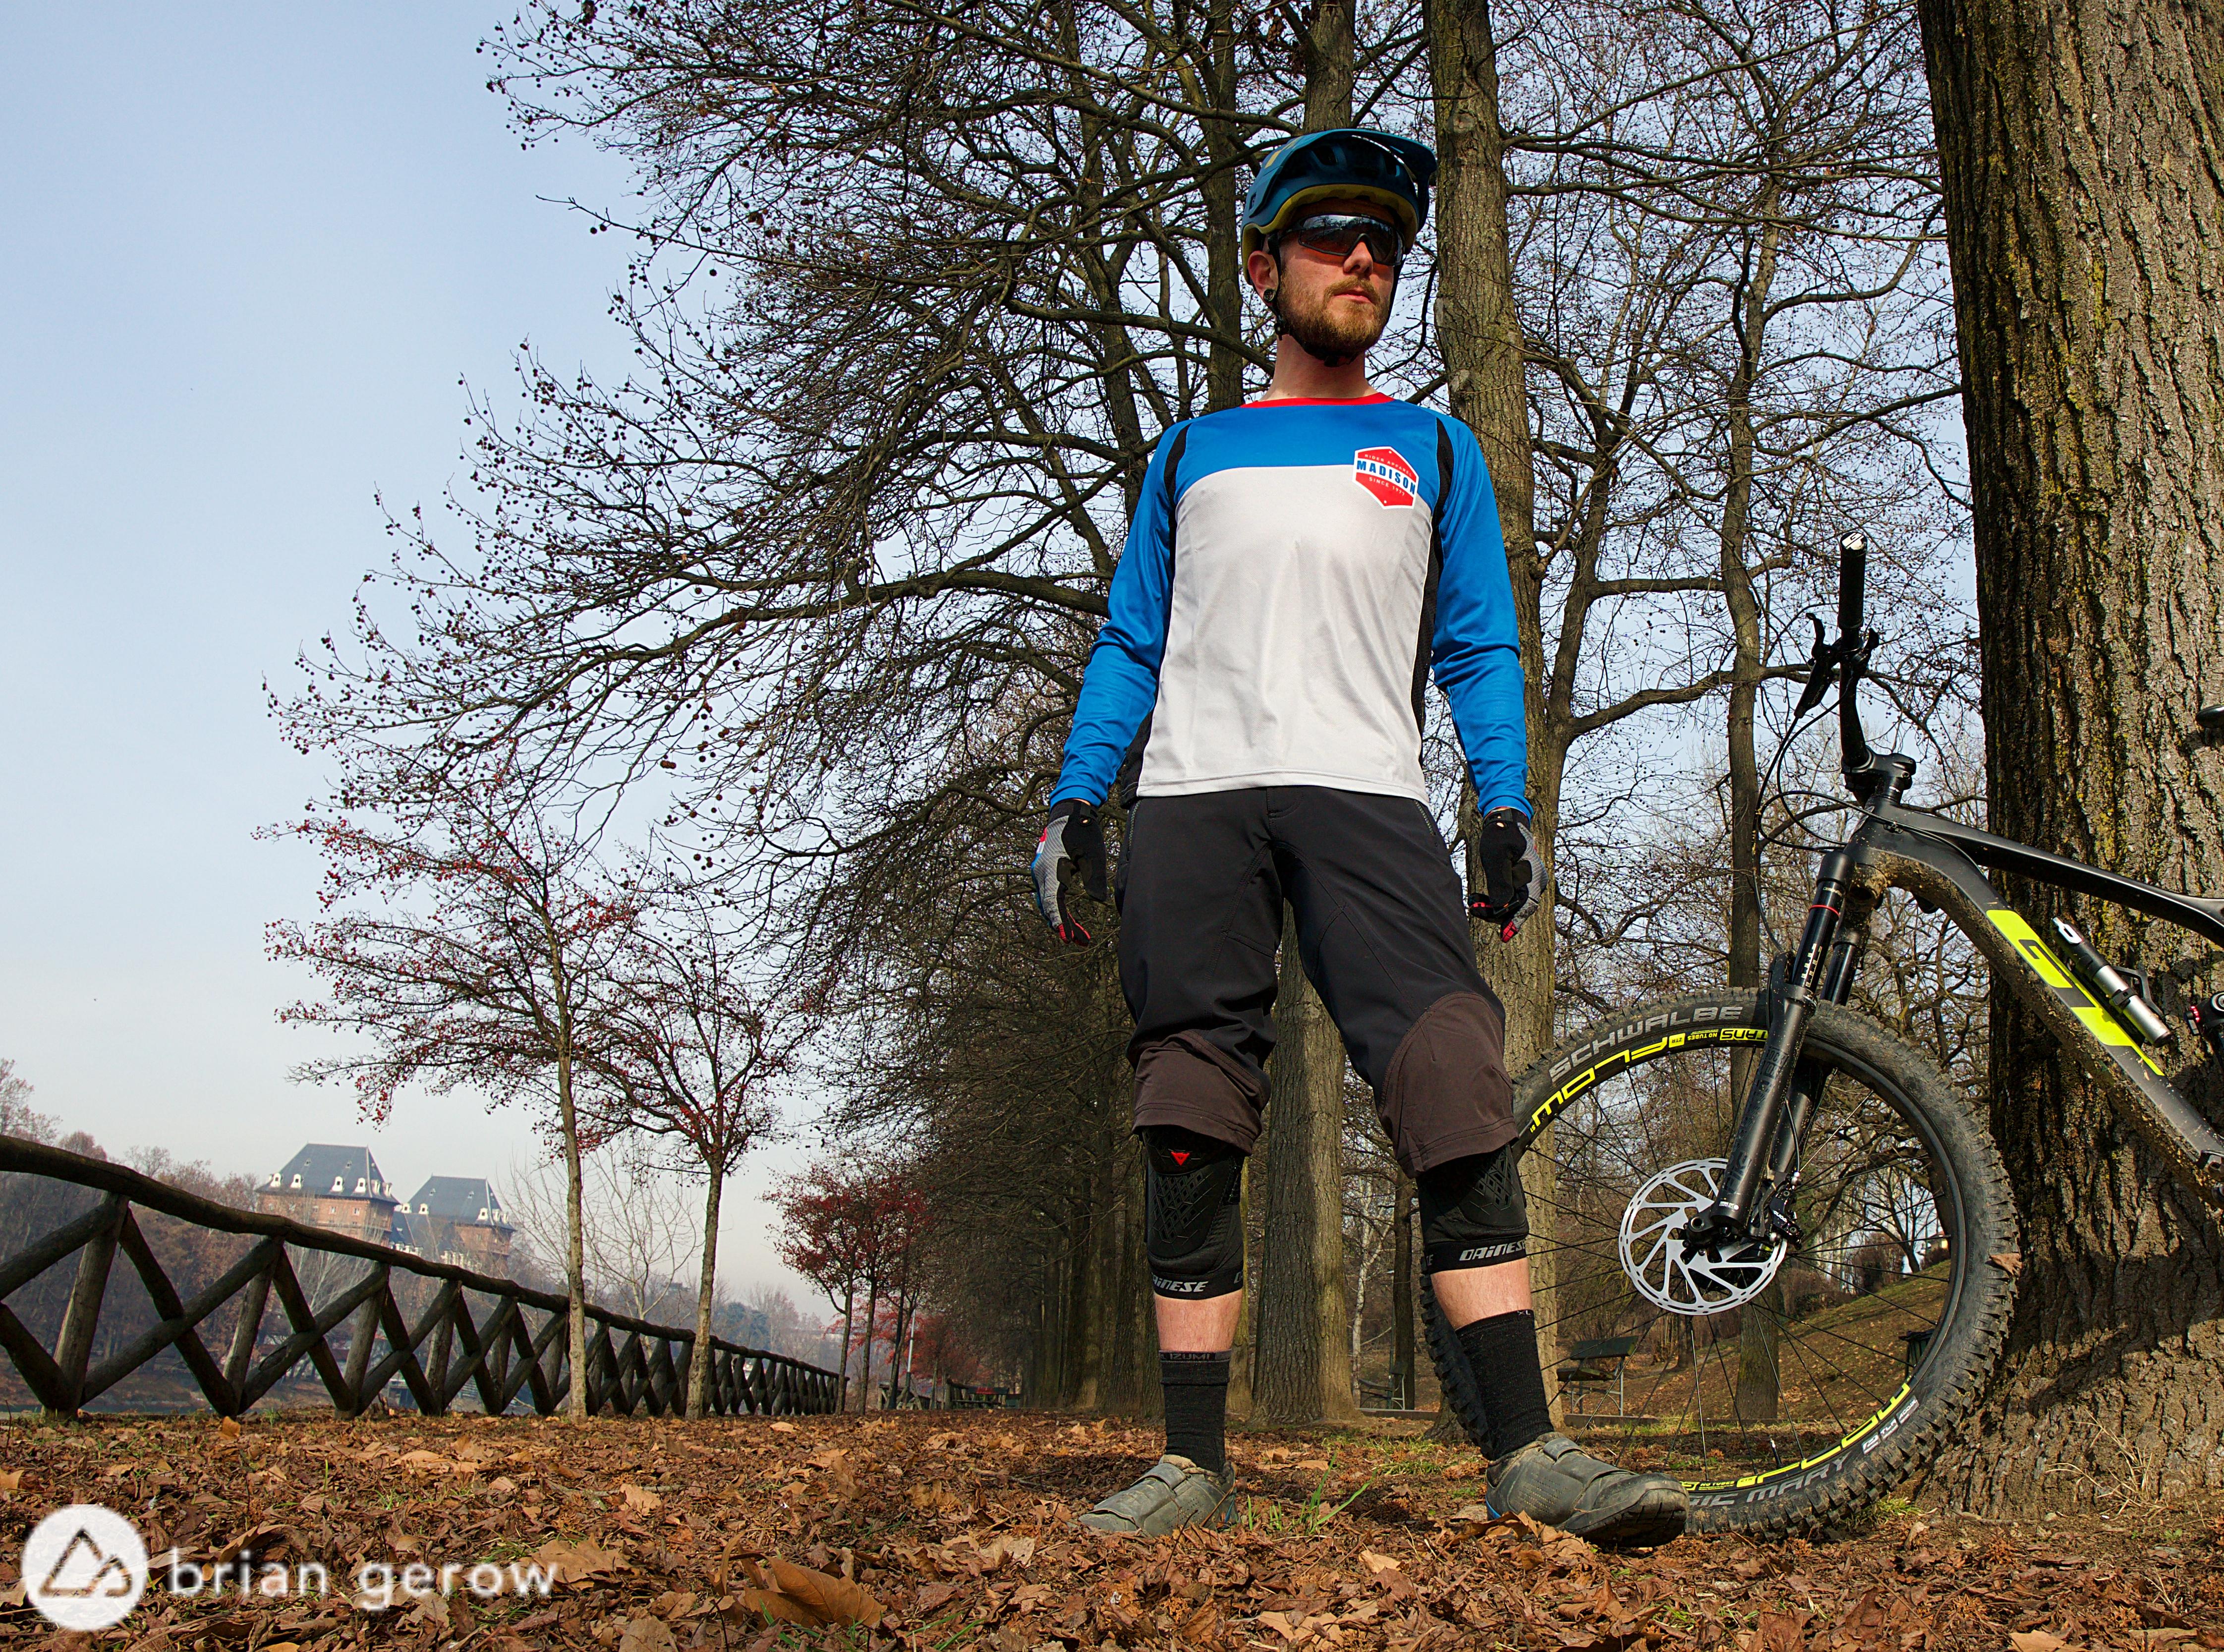 F Mens Cycling Jersey Half Sleeve Top Cycle Racing Team Quality Biking Top x